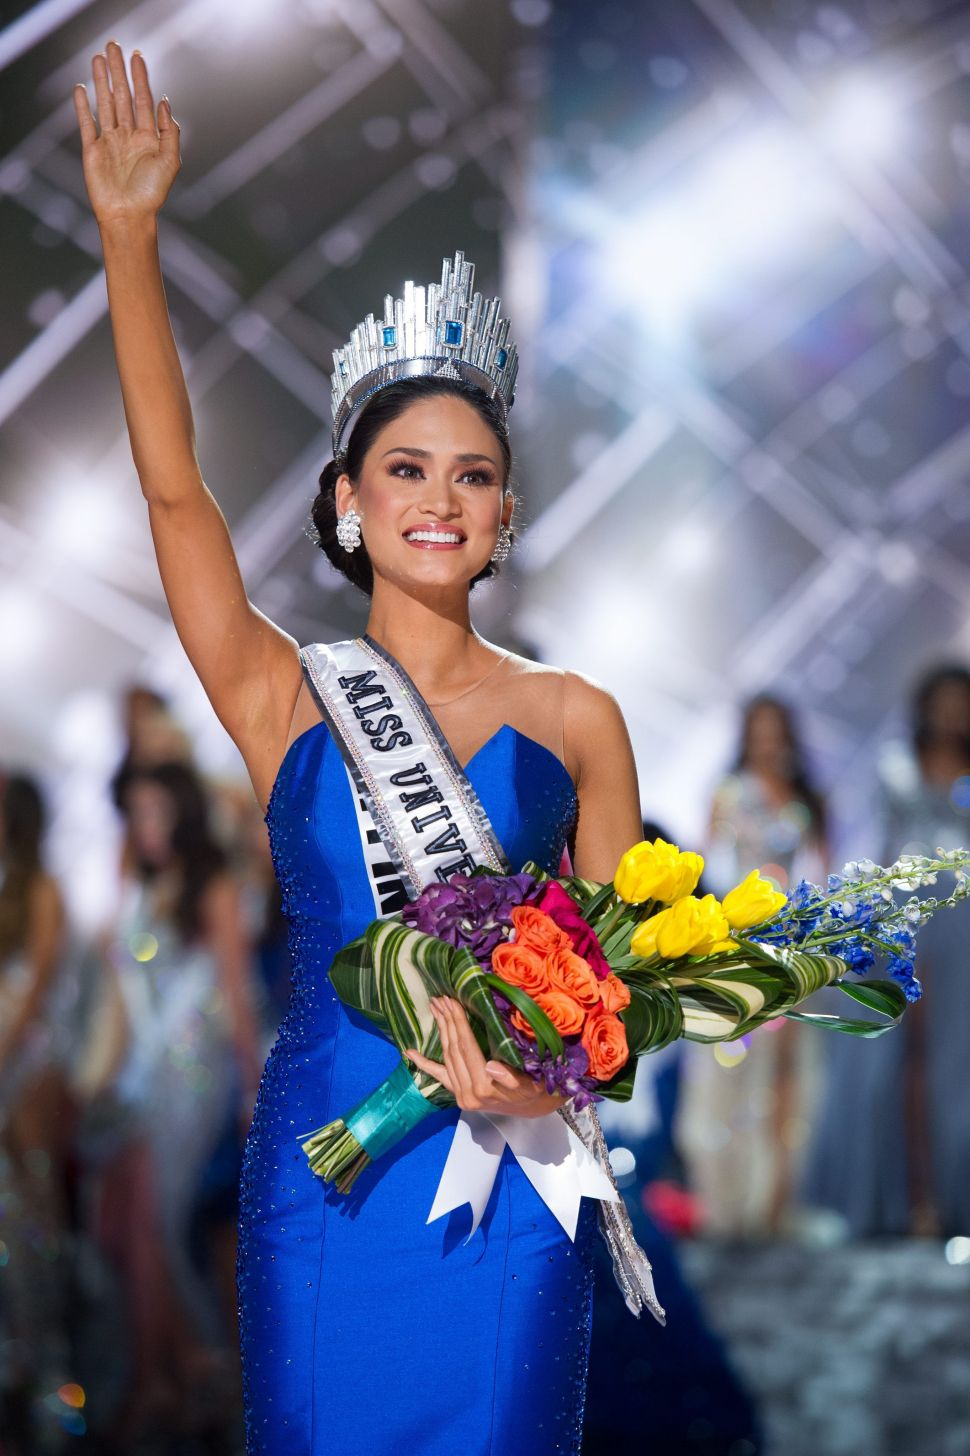 Miss Universo 2015, belleza y mucha polémica